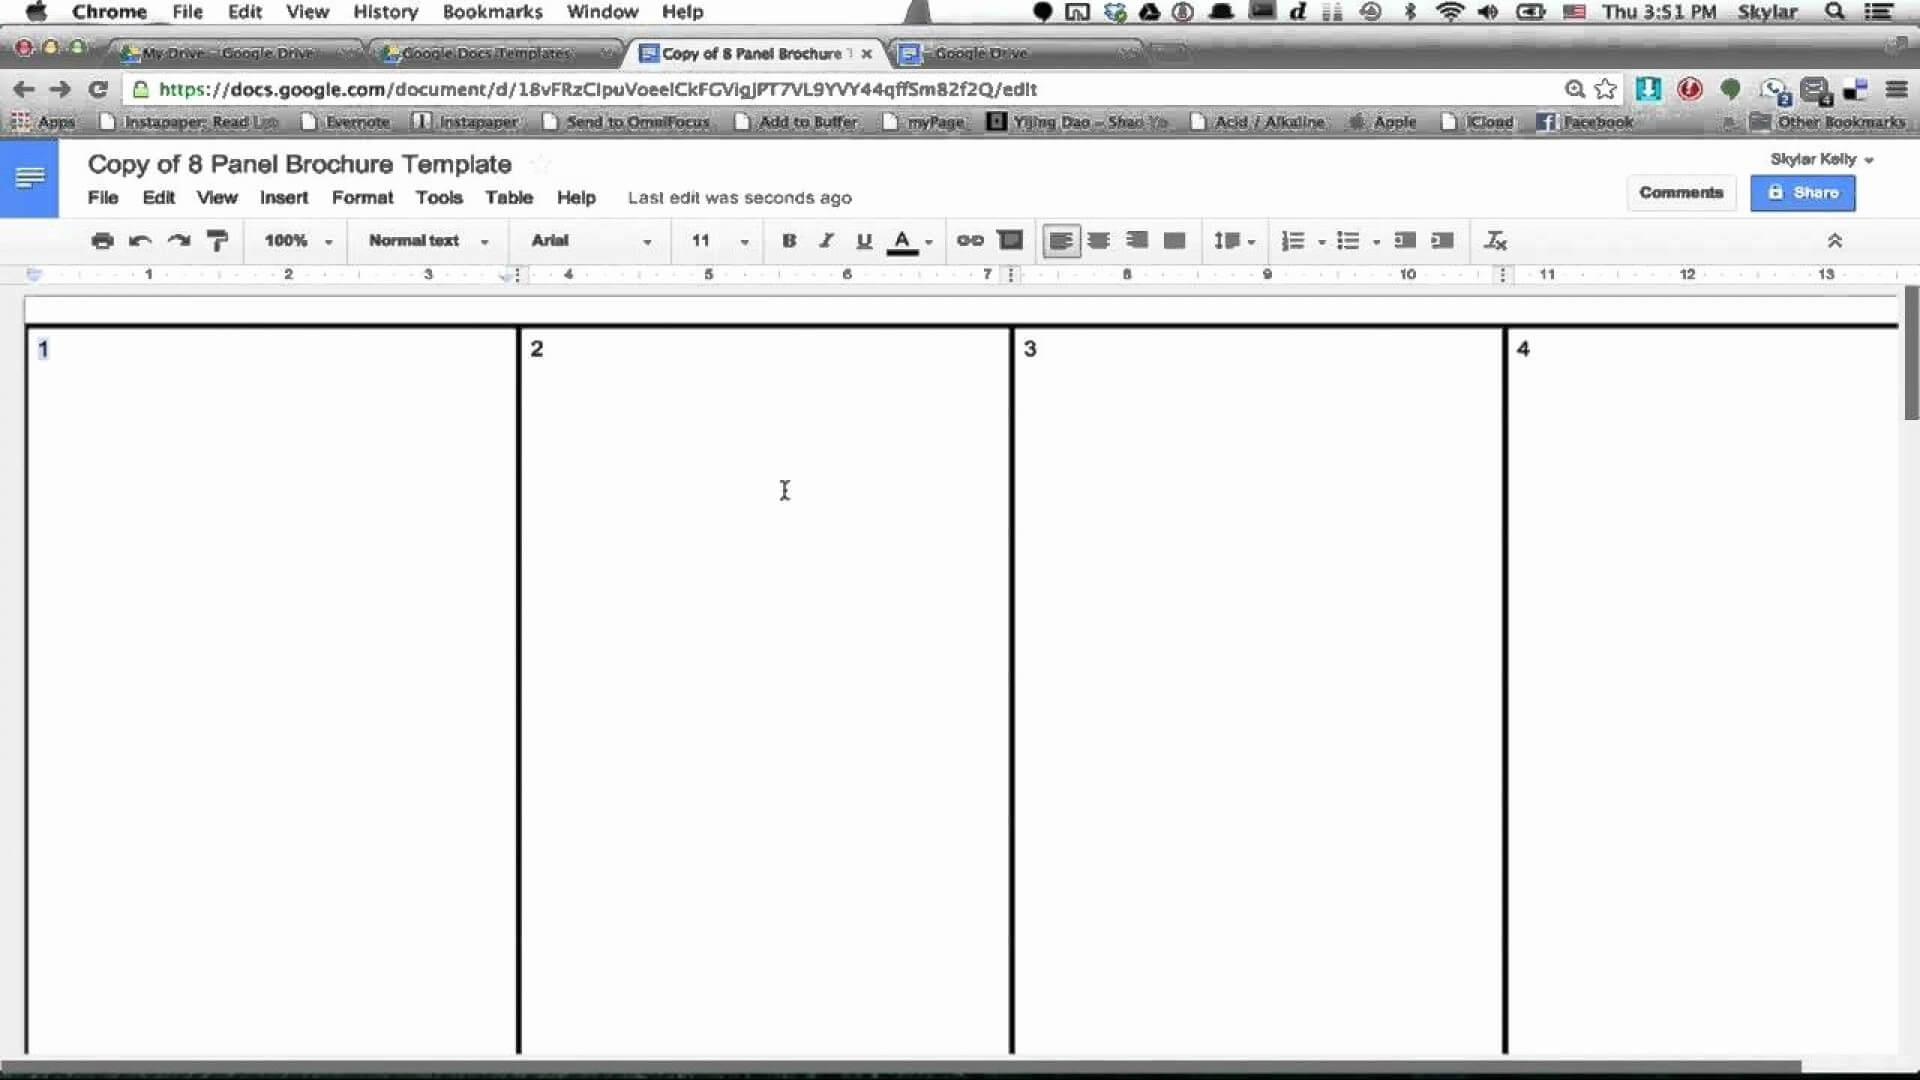 009 Google Drive Brochure Templates Template Ideas Free intended for Brochure Templates Google Drive